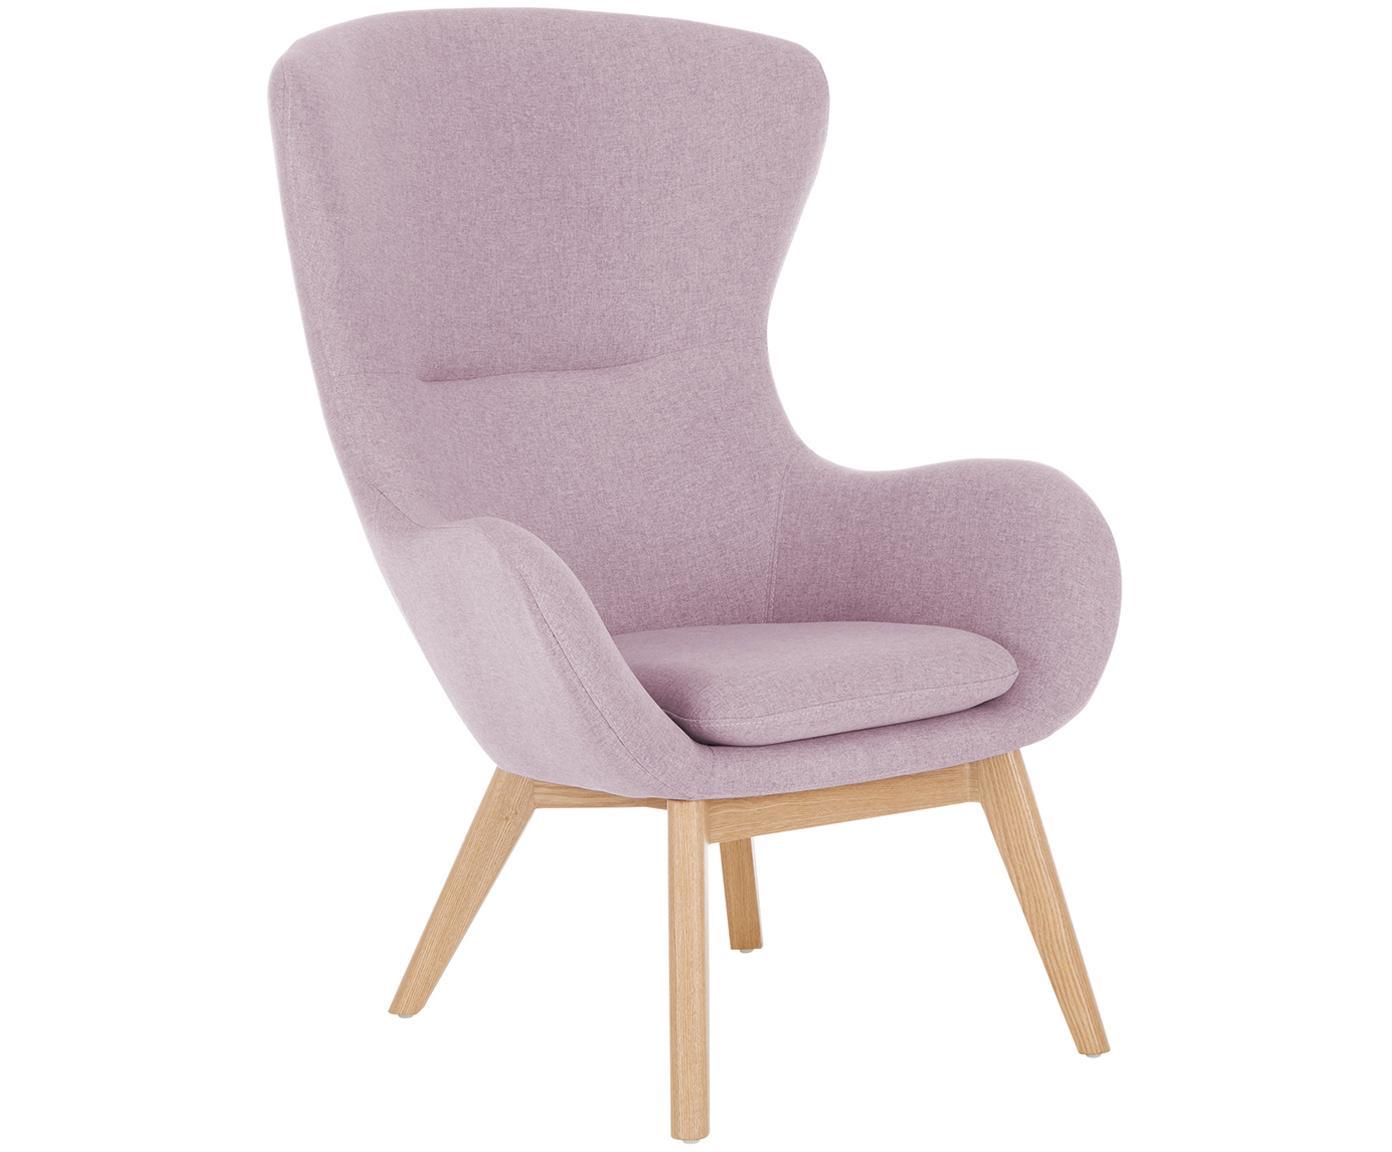 Sessel Wing in Rosa, Bezug: Polyester 40.000 Scheuert, Füße: Massivholz mit Eschenfurn, Rosa, 77 x 106 cm